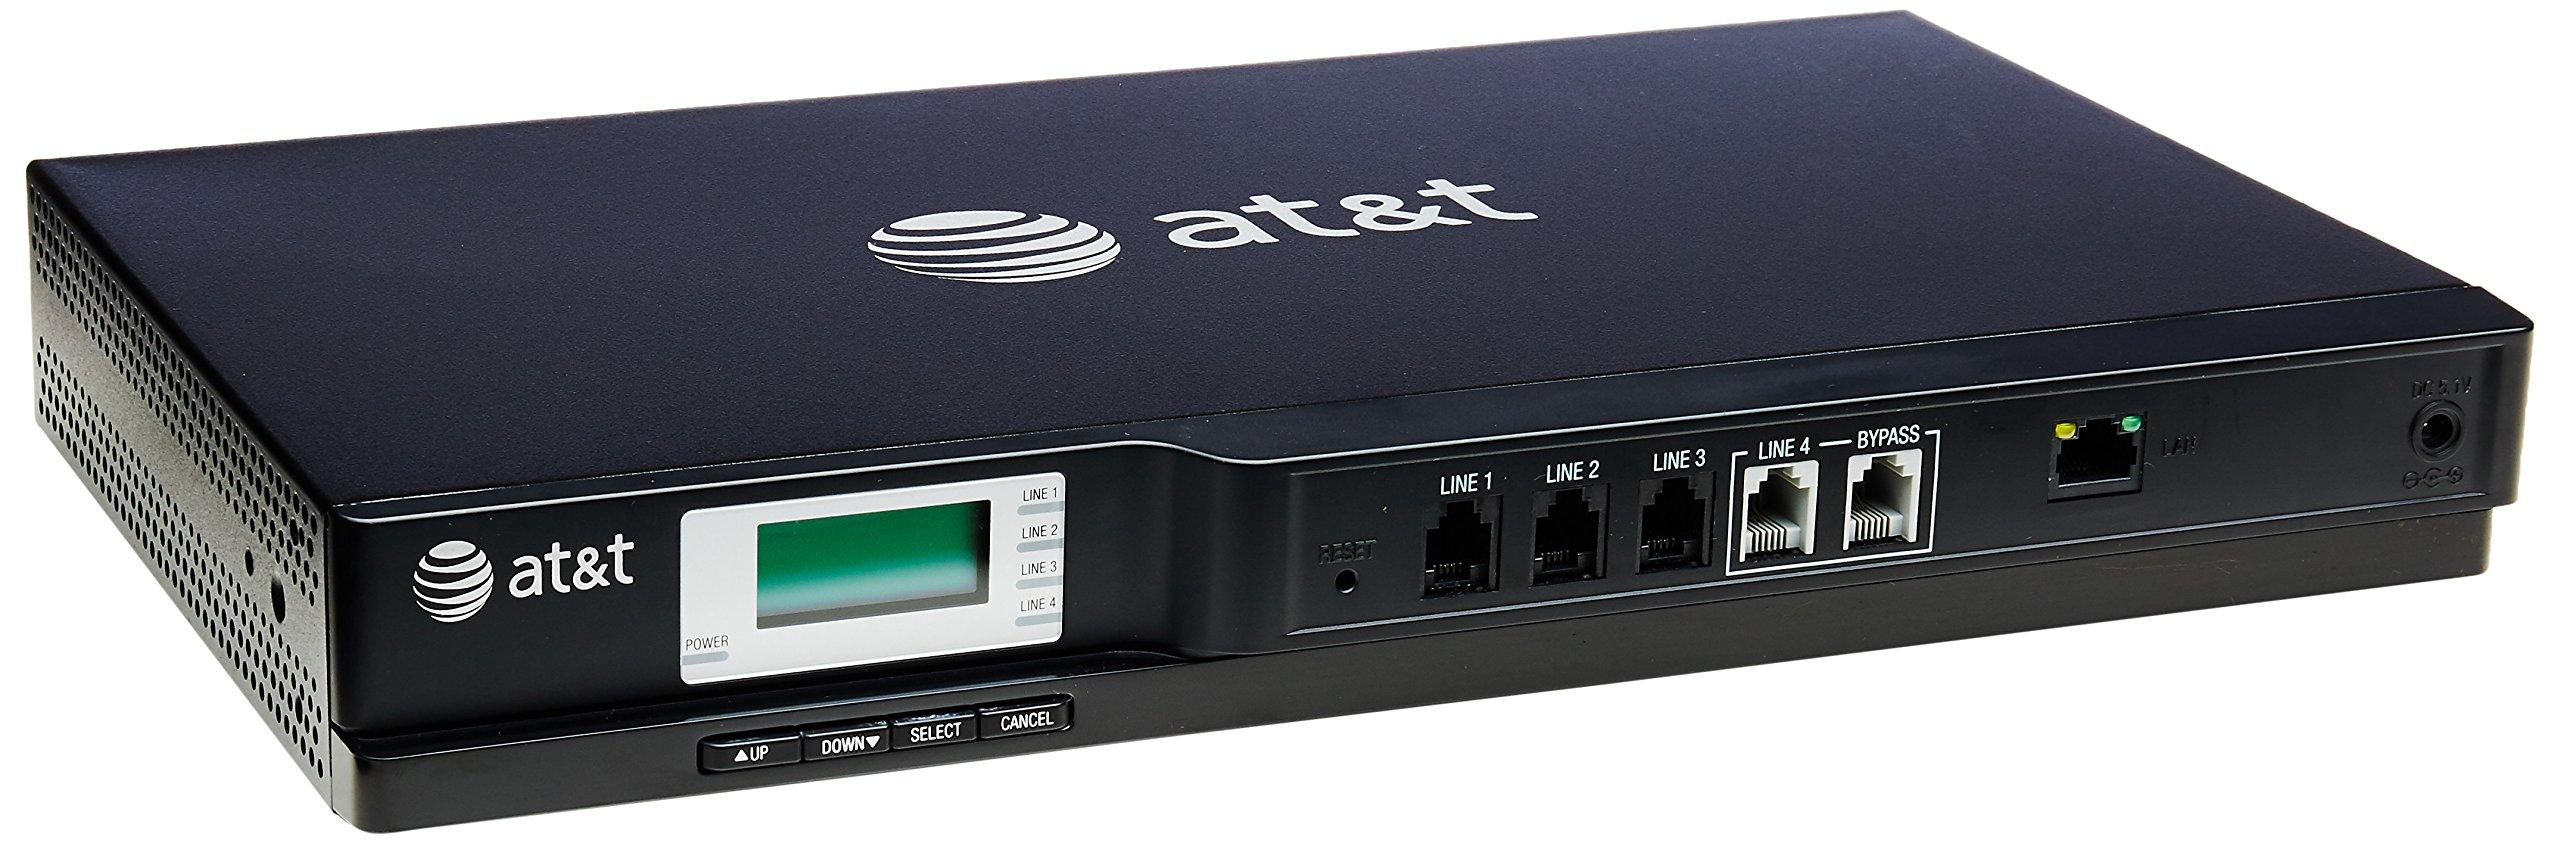 AT&T SB35010 Syn248 Analog Gateway 4-Line Landline Telephone